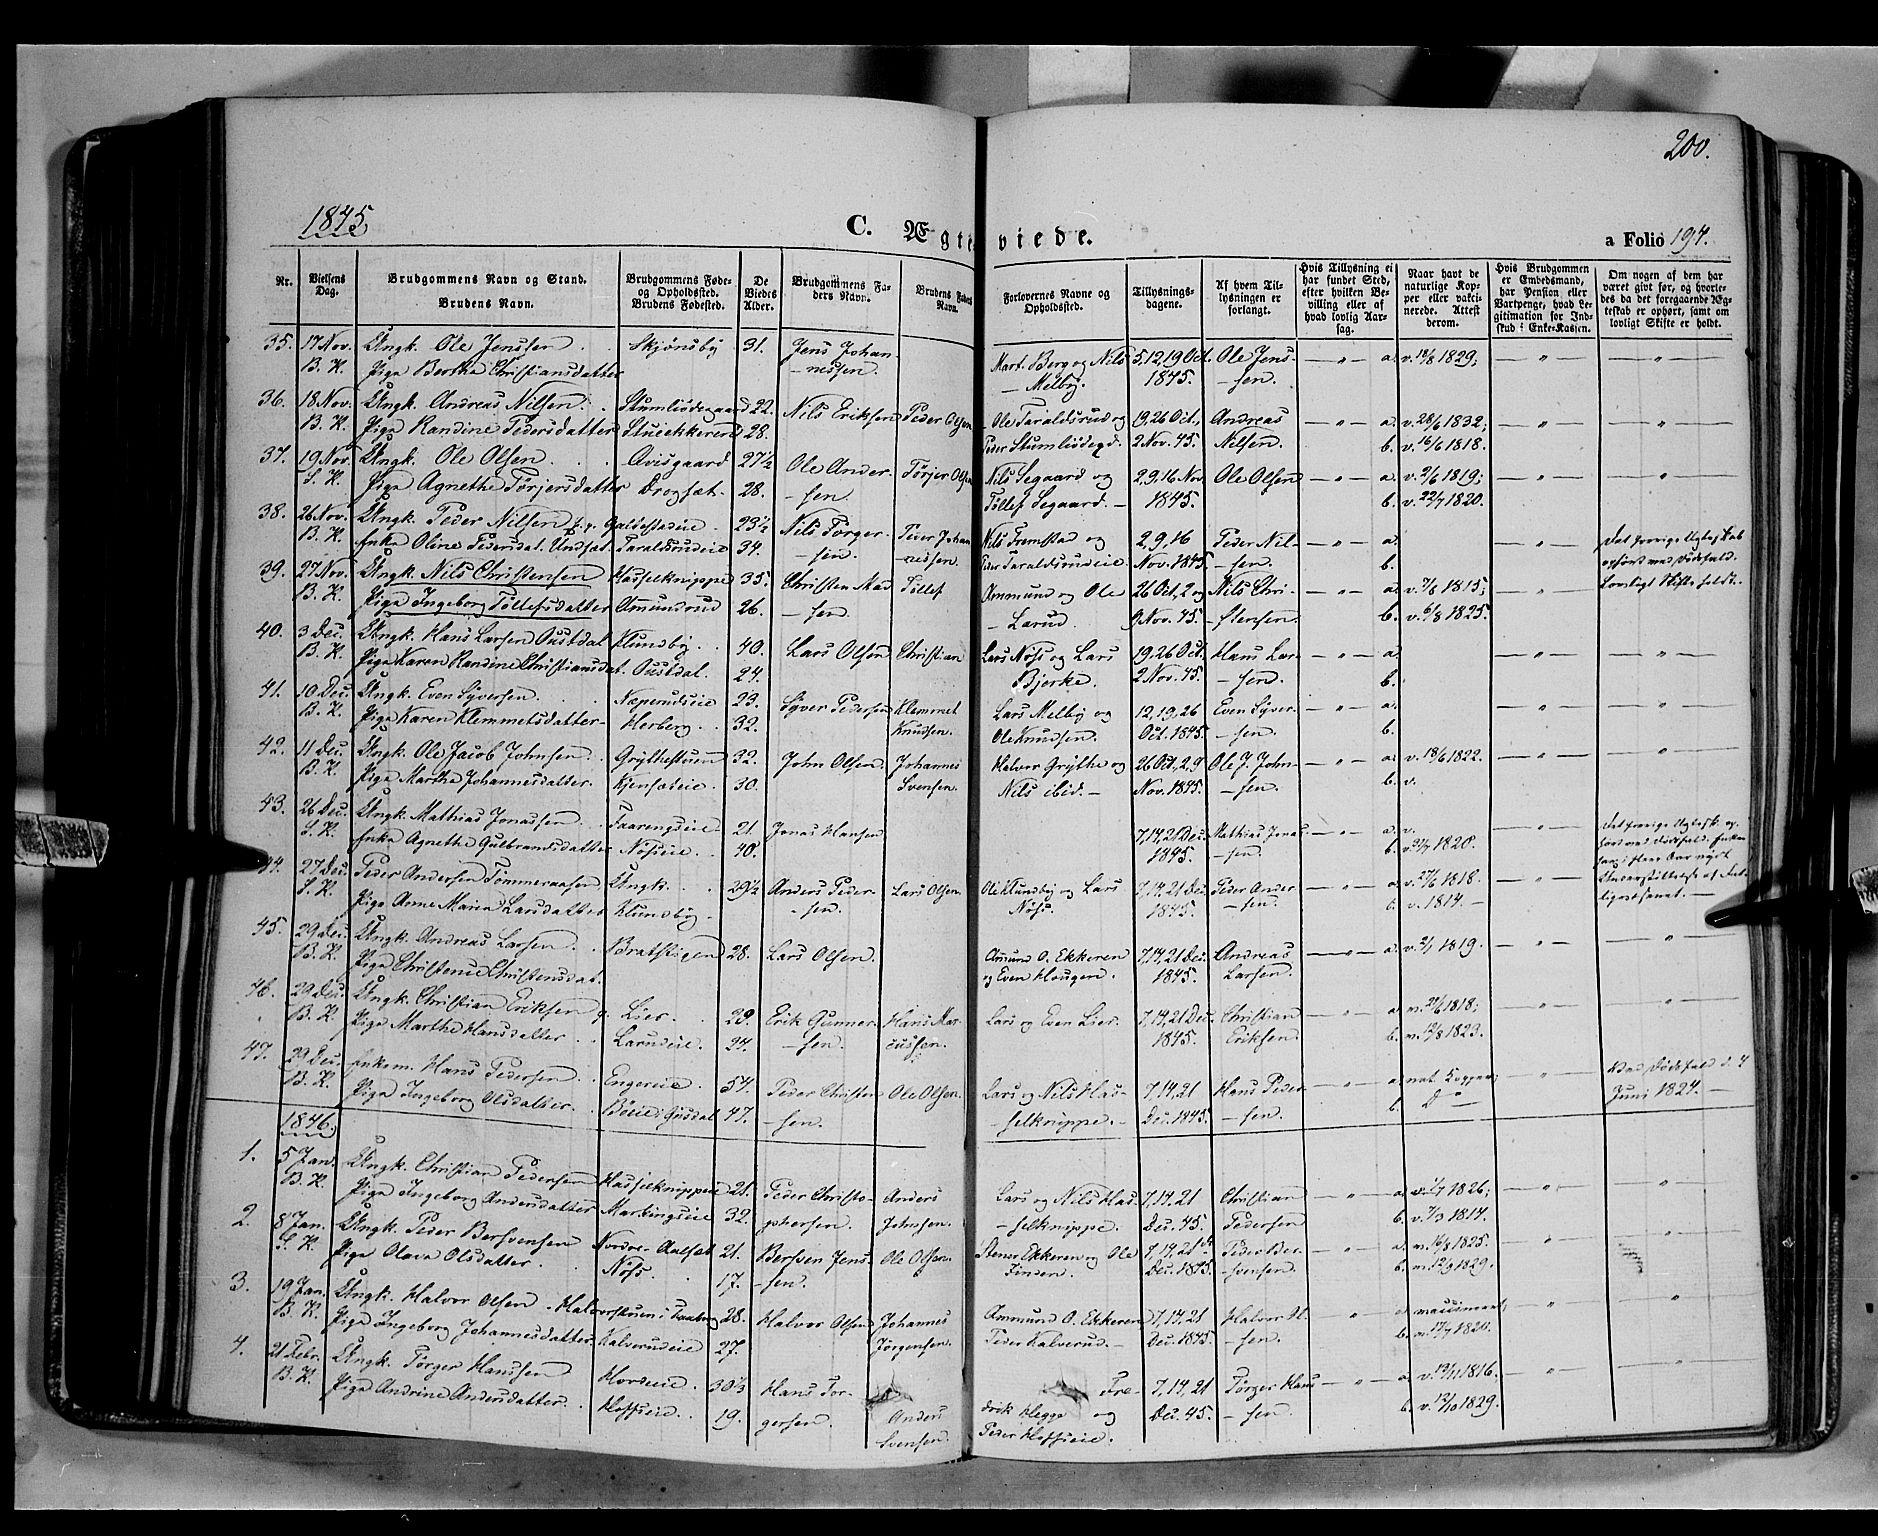 SAH, Biri prestekontor, Ministerialbok nr. 5, 1843-1854, s. 200